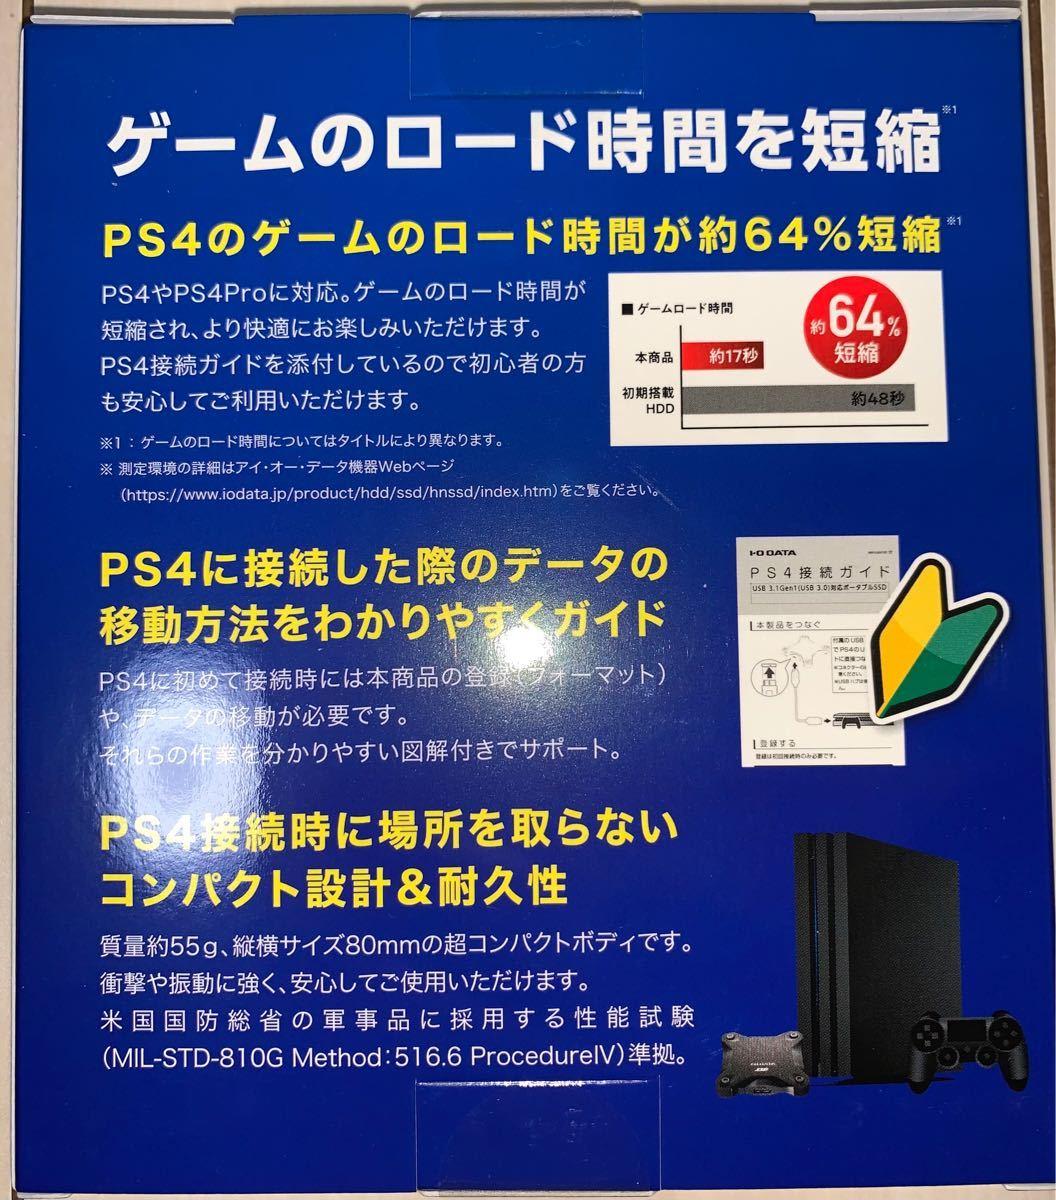 PS4対応 外付けSSD 480GB Happinet HNSSD-480BK 新品未使用 送料込